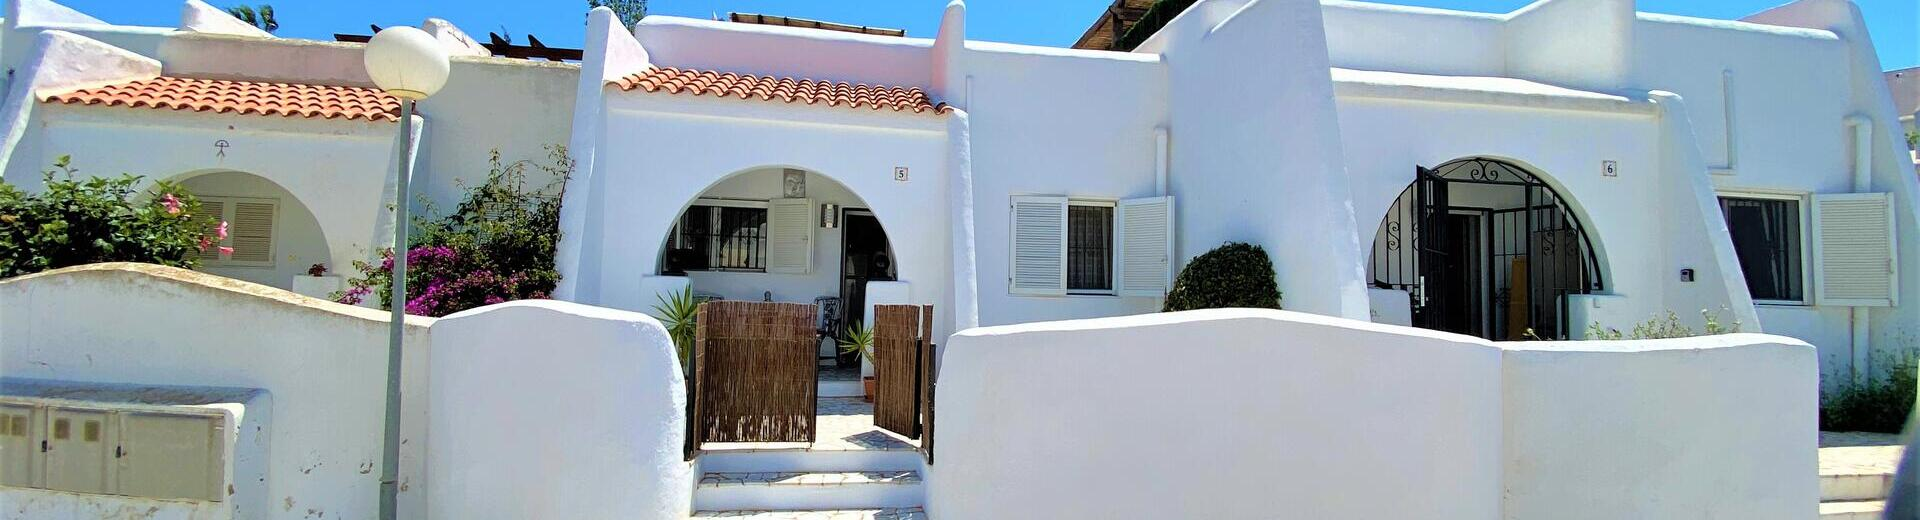 VIP7902: Villa à vendre